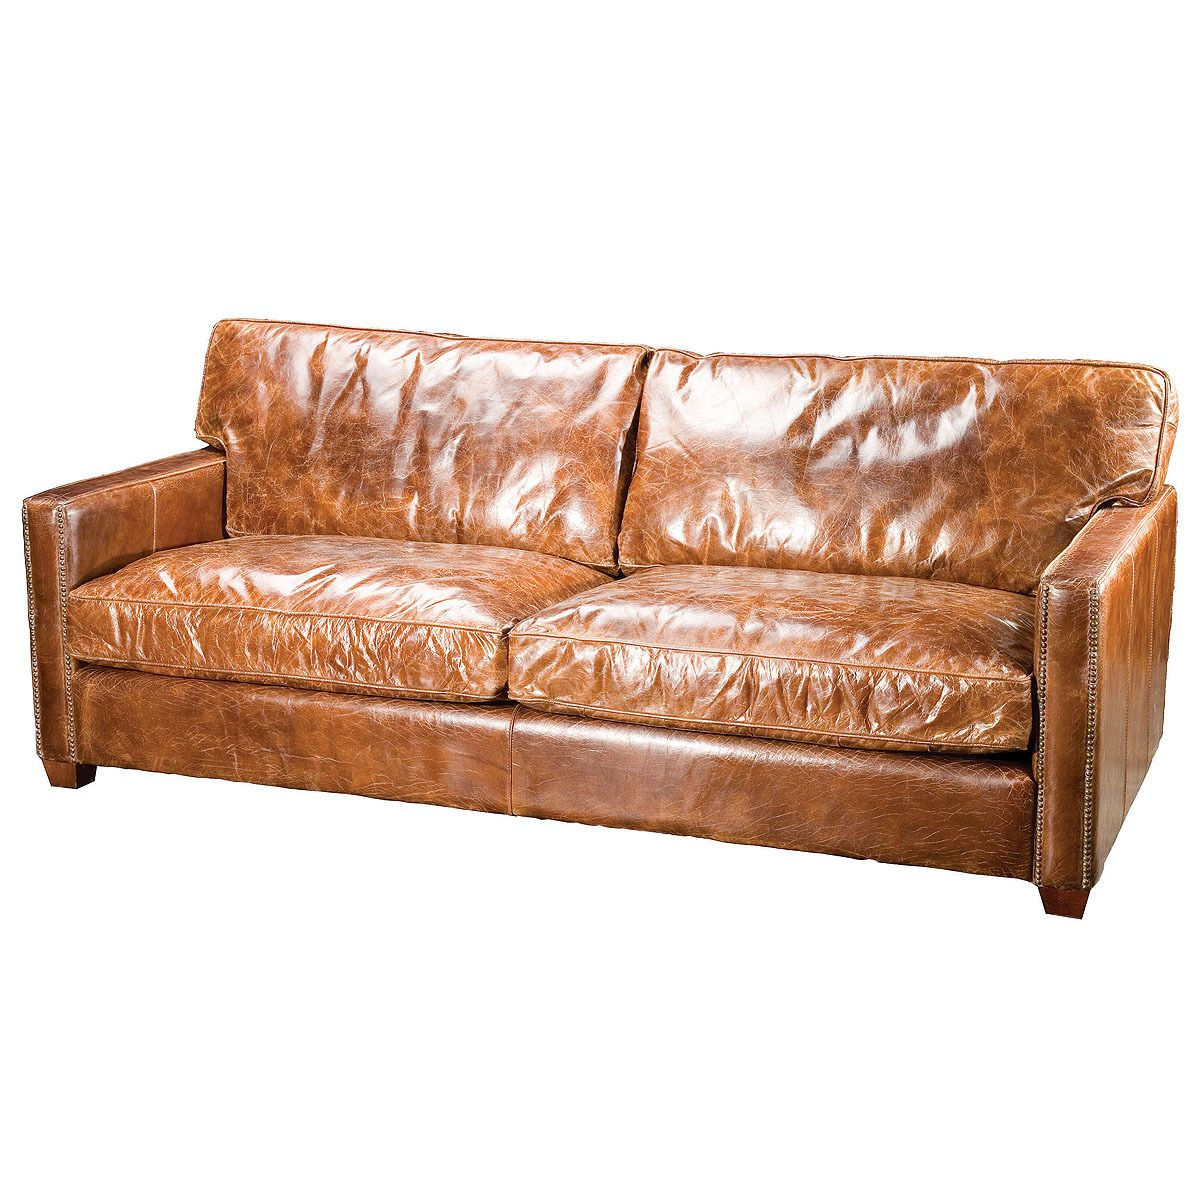 Larkin 3 Seater Vintage Cigar Distressed Leather Sofa In 2020